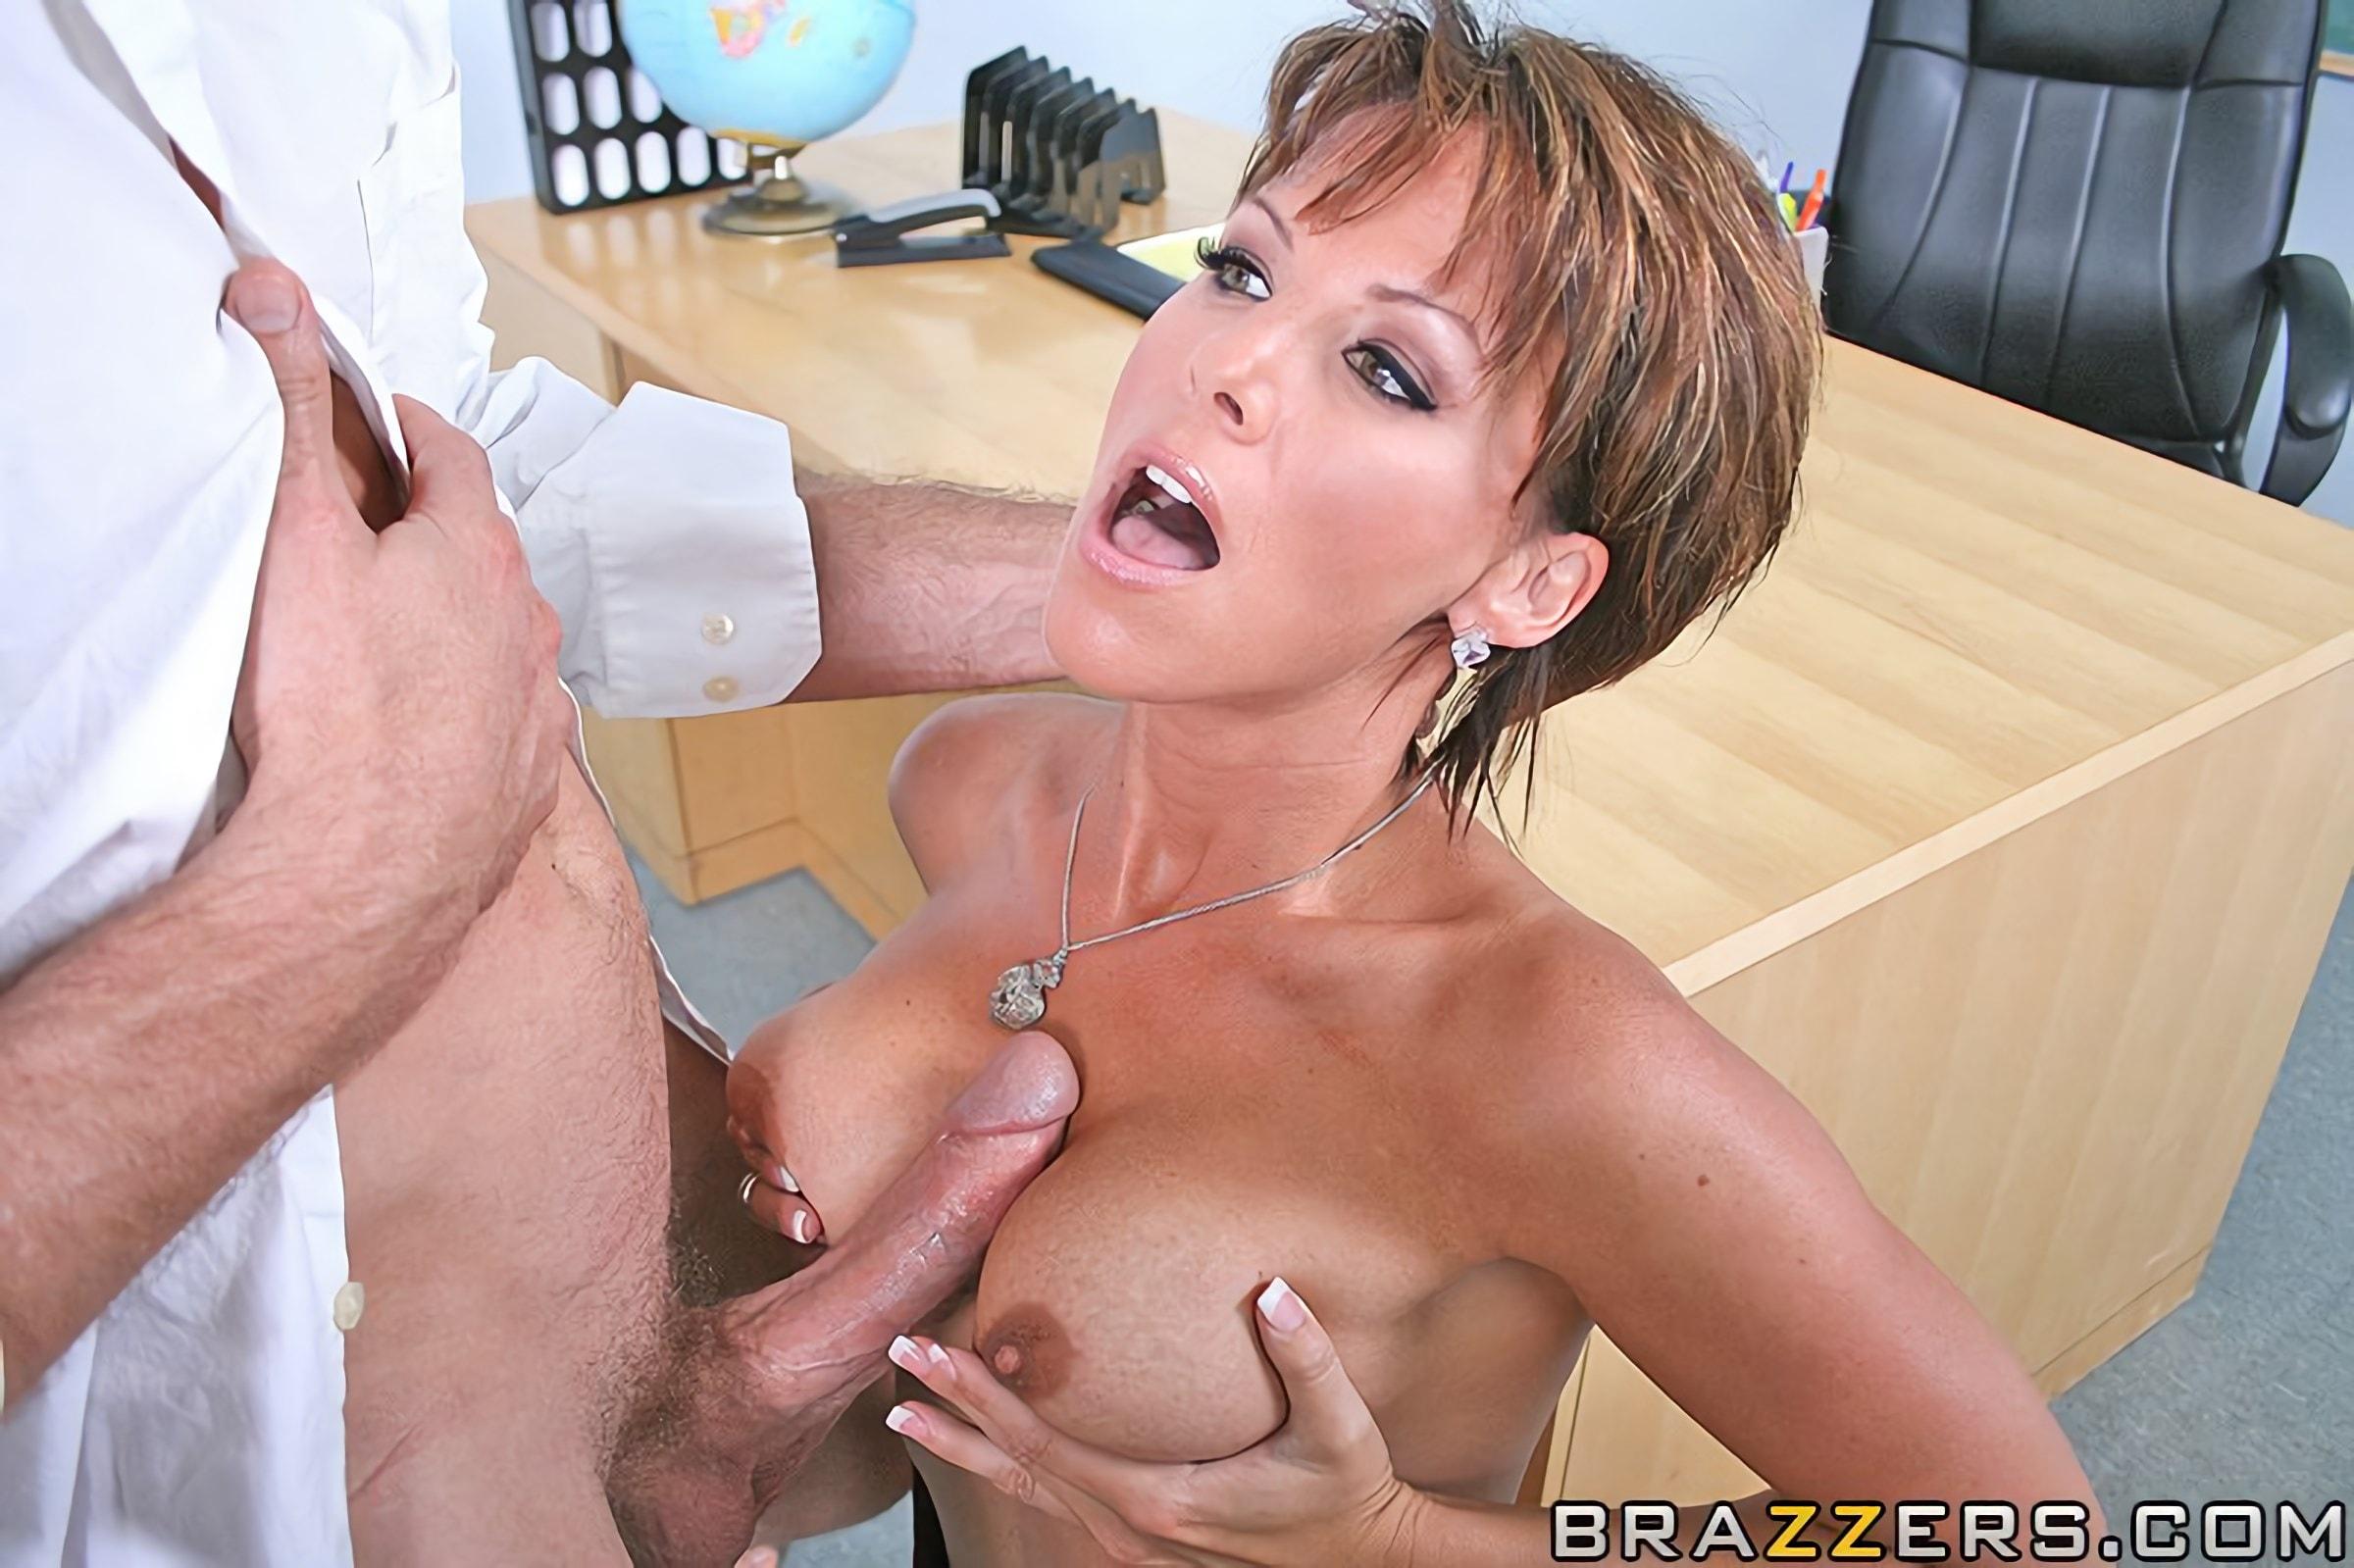 New kayla synz porn pics